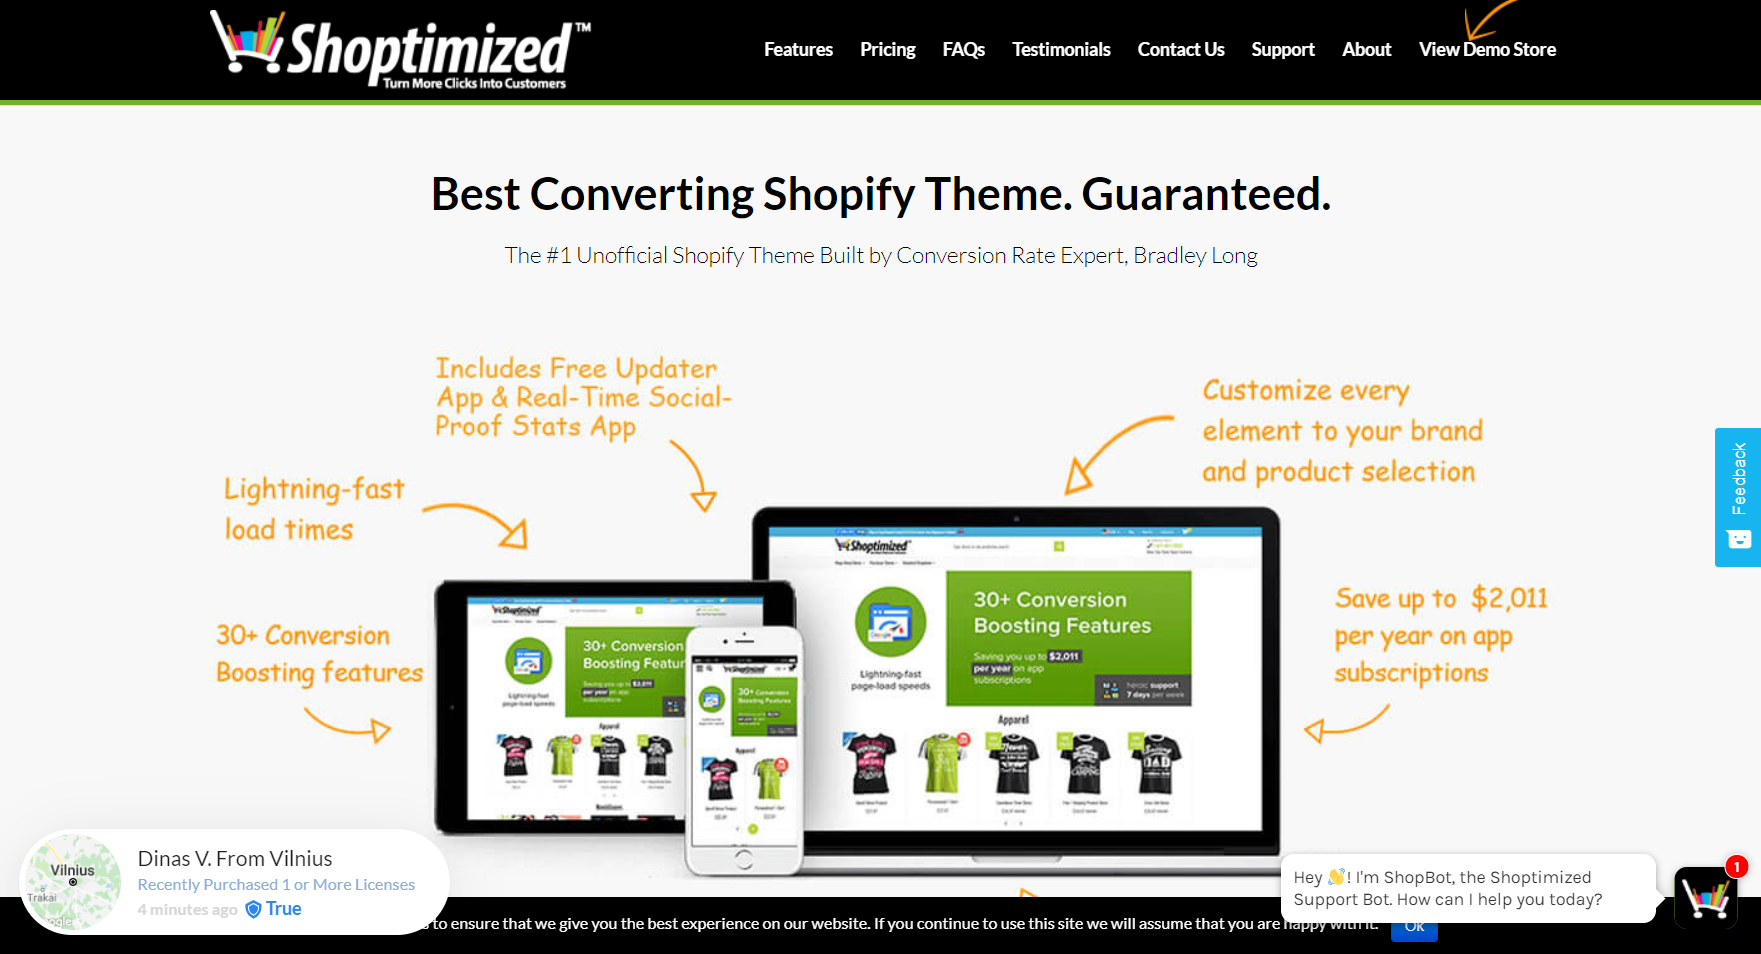 Shoptimized™ - Highest Converting Shopify Theme